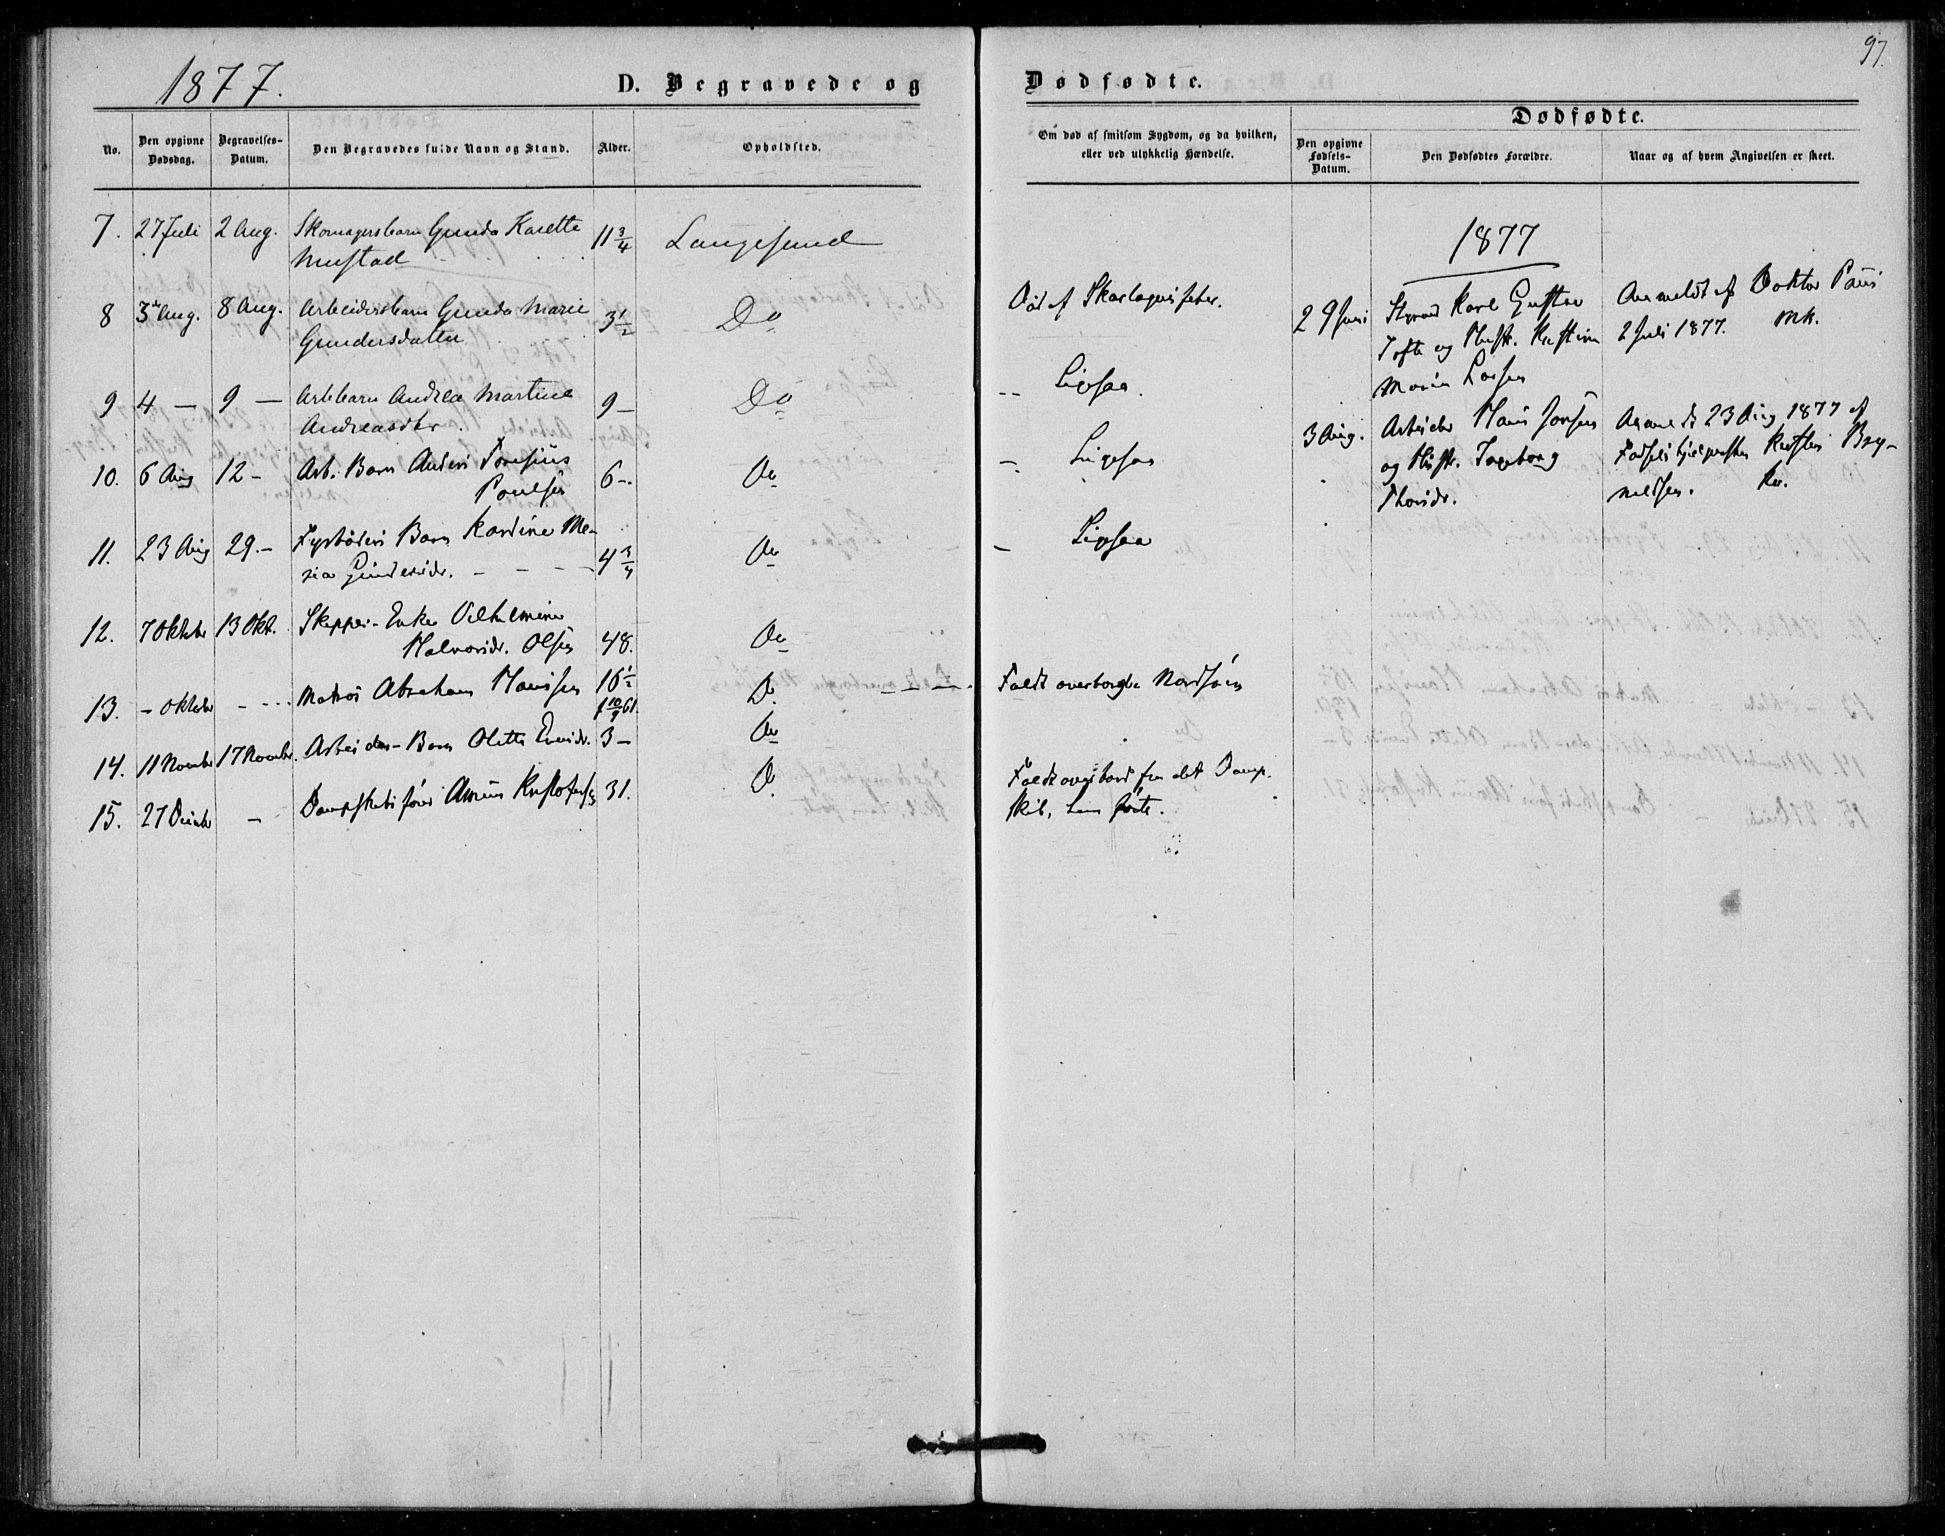 SAKO, Langesund kirkebøker, F/Fa/L0001: Ministerialbok nr. 1, 1870-1877, s. 97